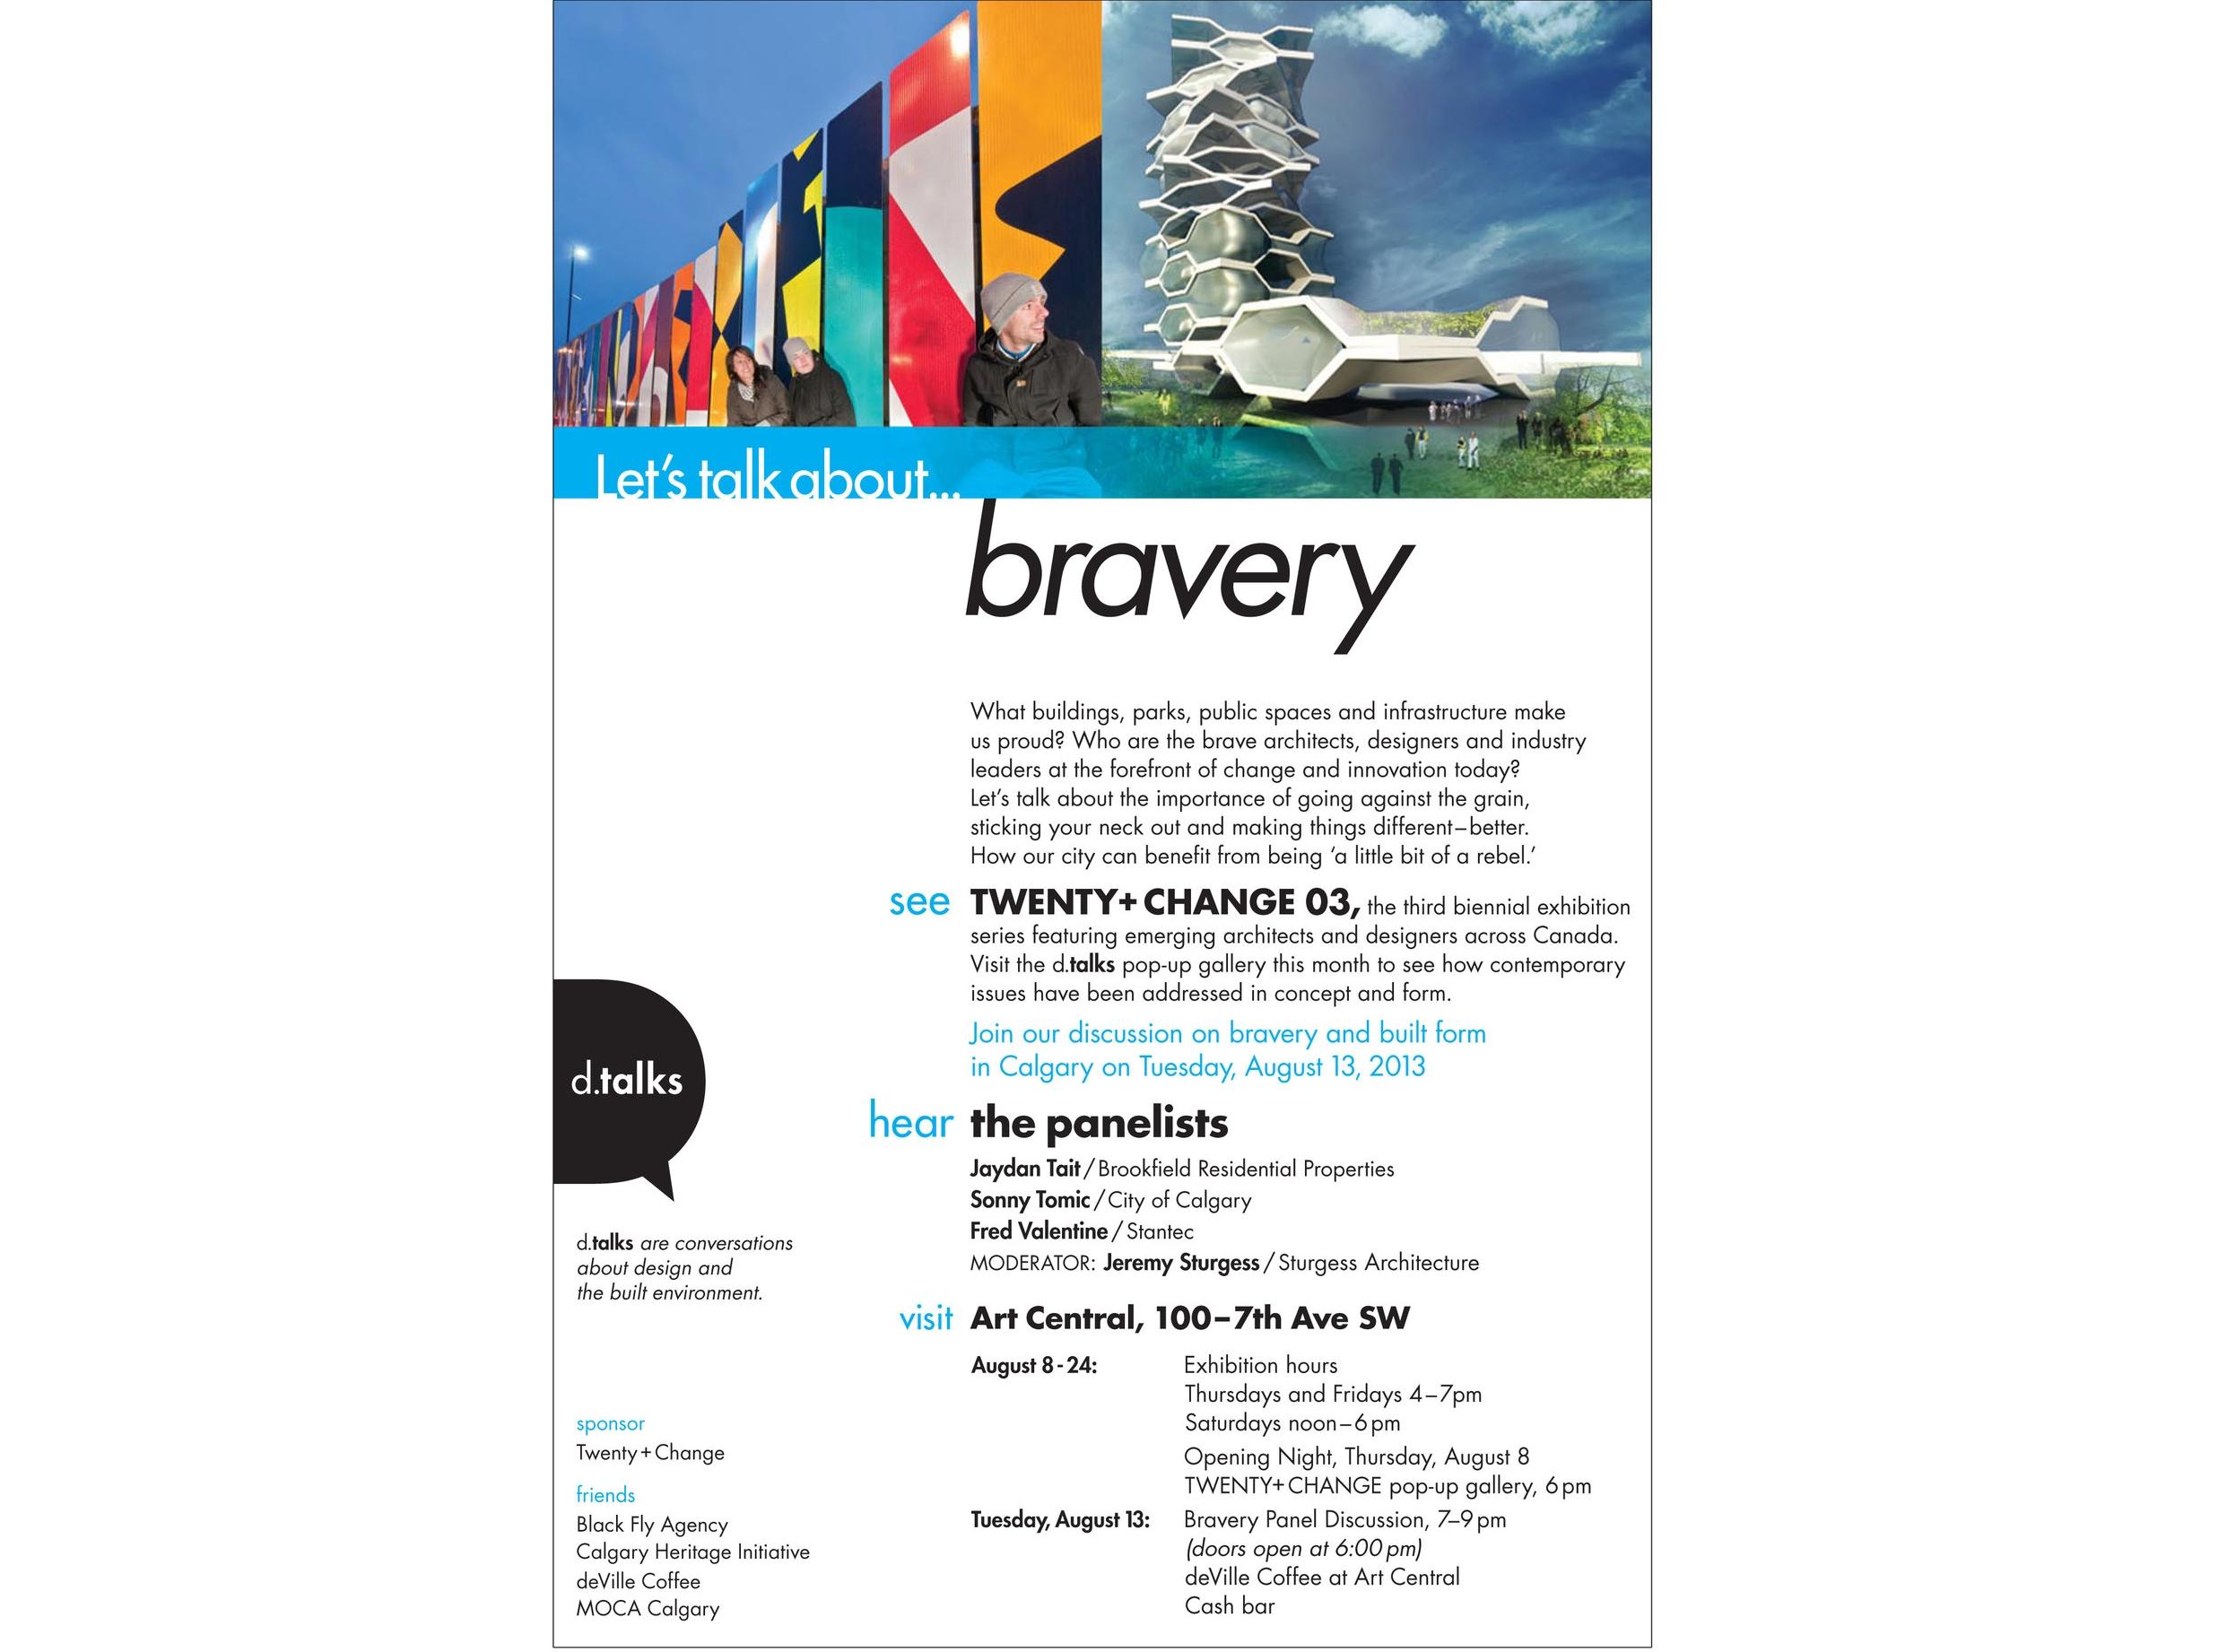 dt13_7_Bravery_InvitationFinal-credit_JWons_canvas.jpg